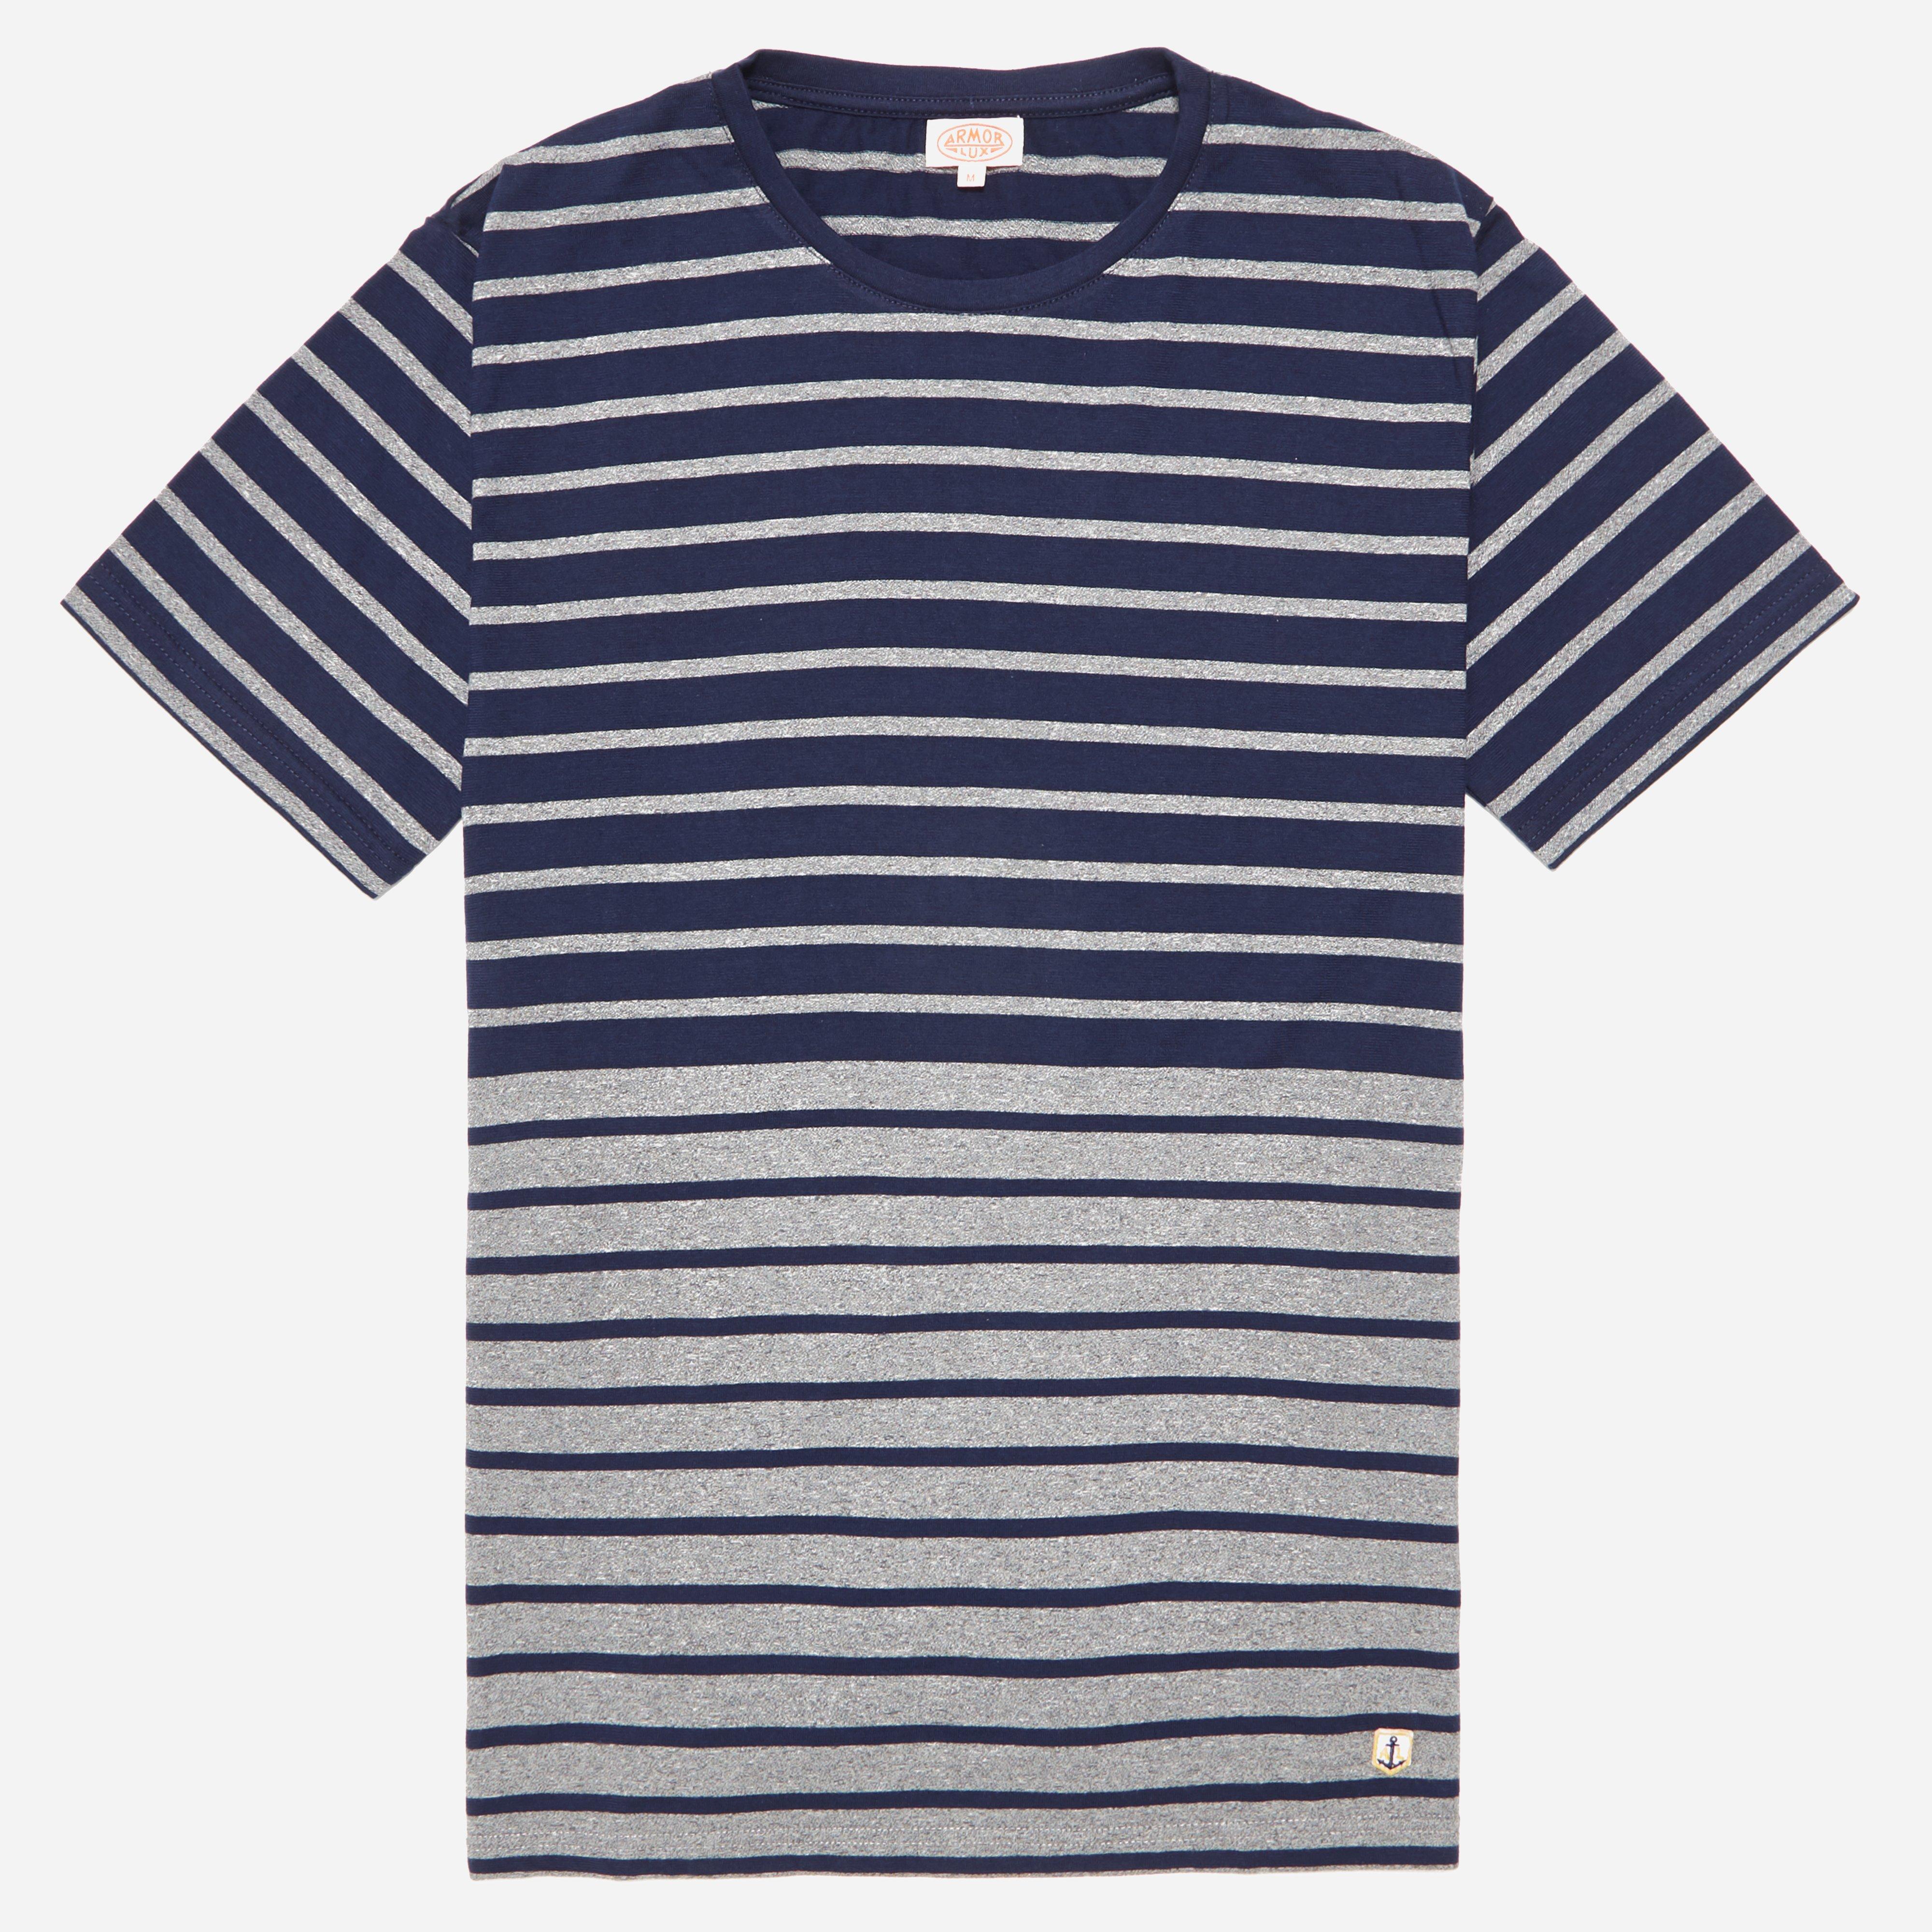 Armor Lux 75747 Stripe T-shirt